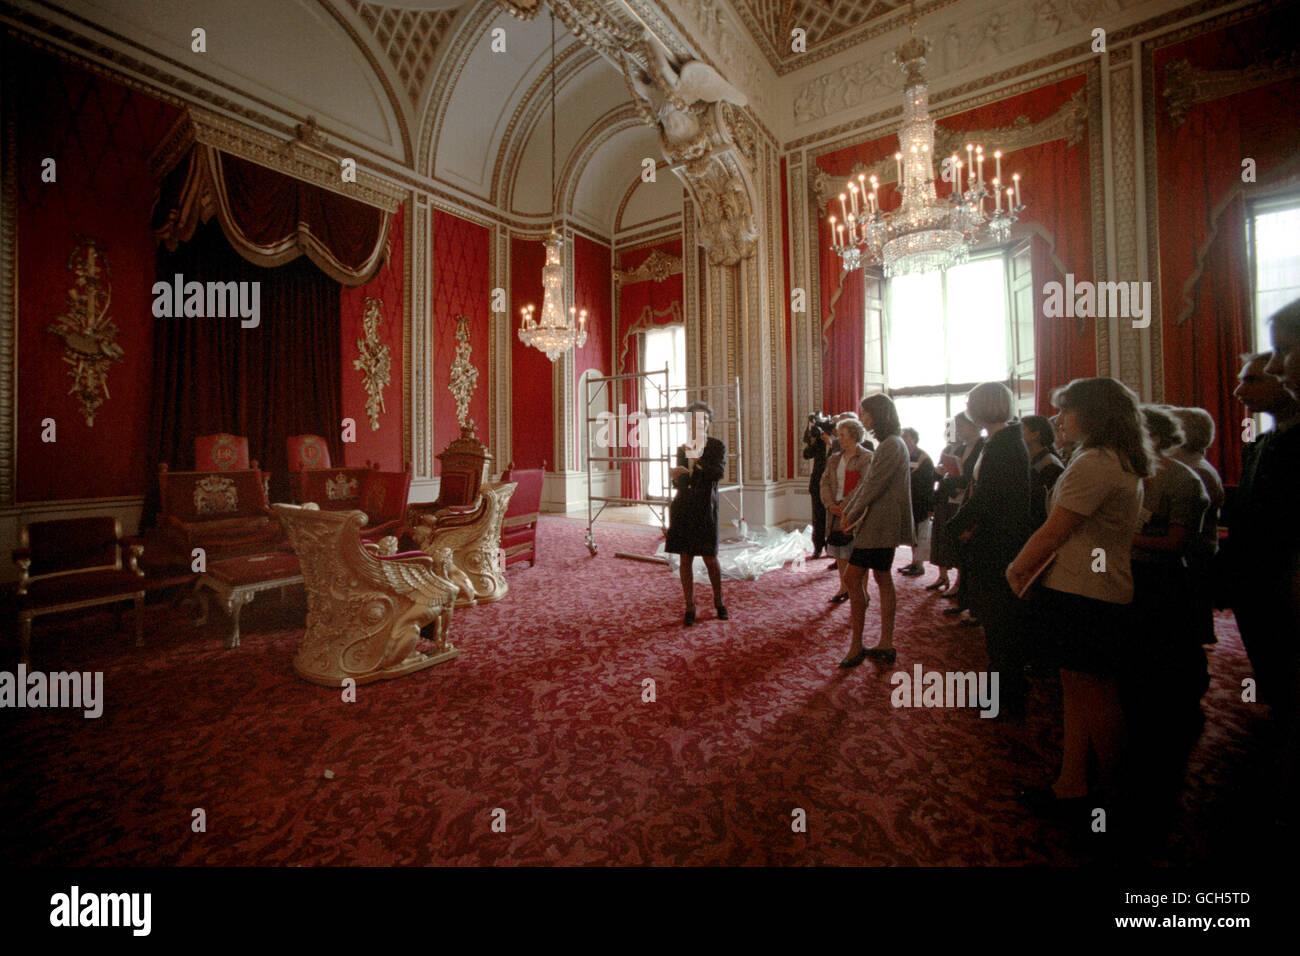 Throne room buckingham palace - Stock Photo Throne Room Buckingham Palace